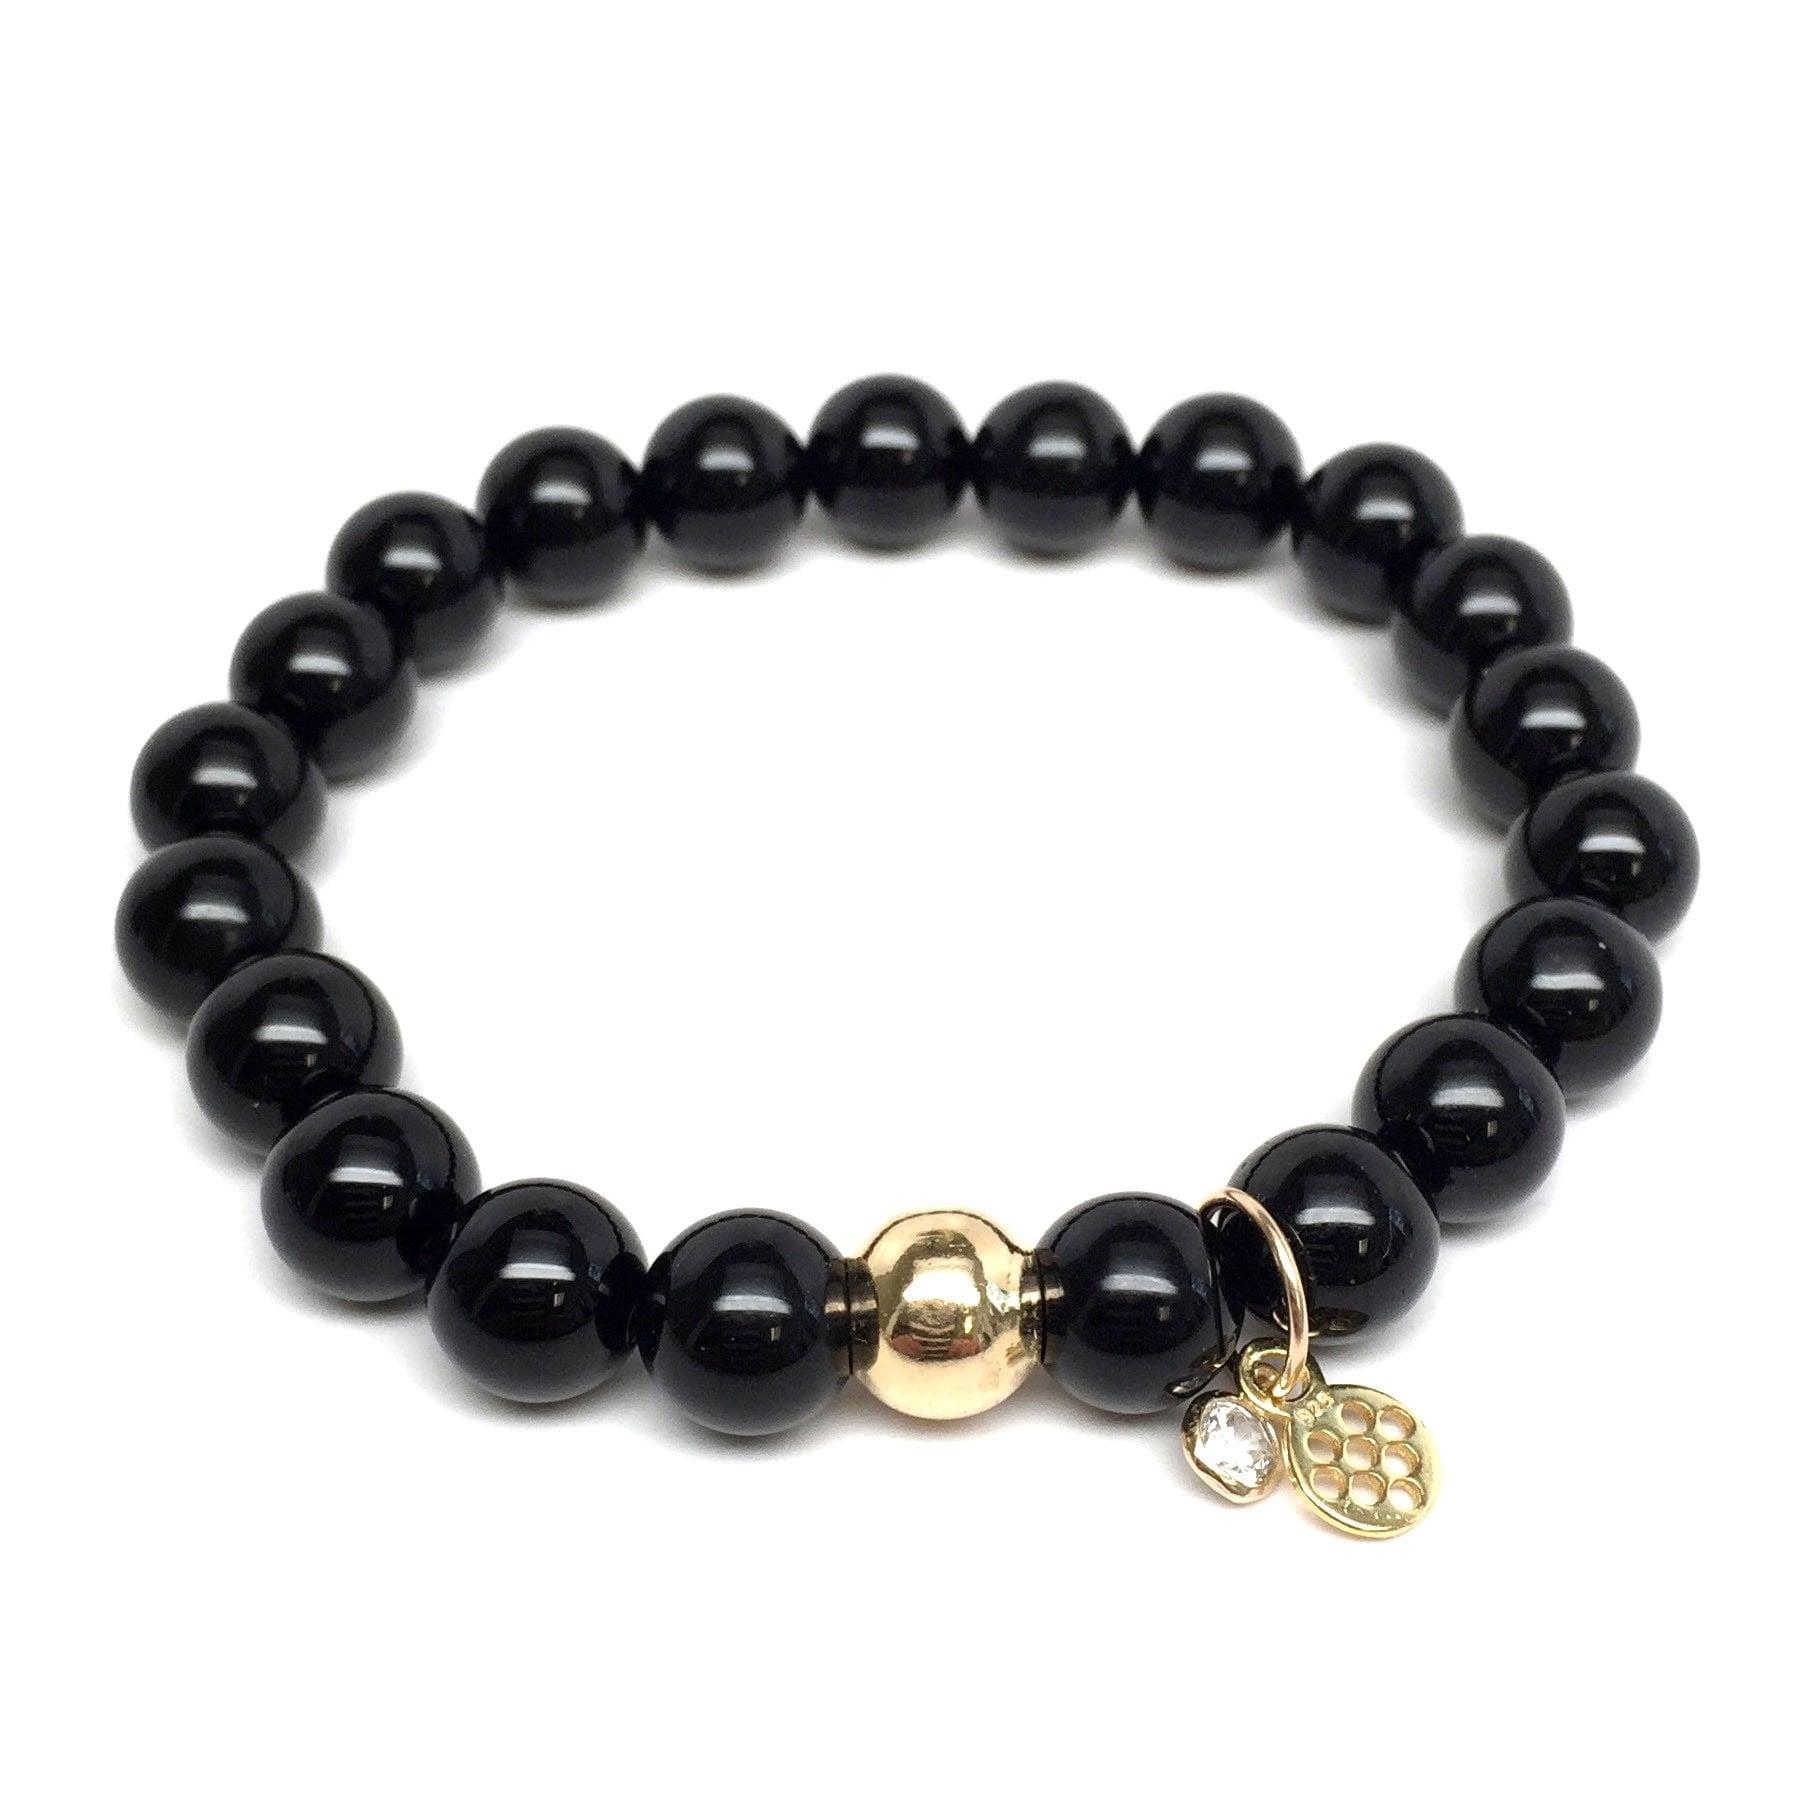 Black Onyx 'Zoe' Stretch Bracelet - Thumbnail 2